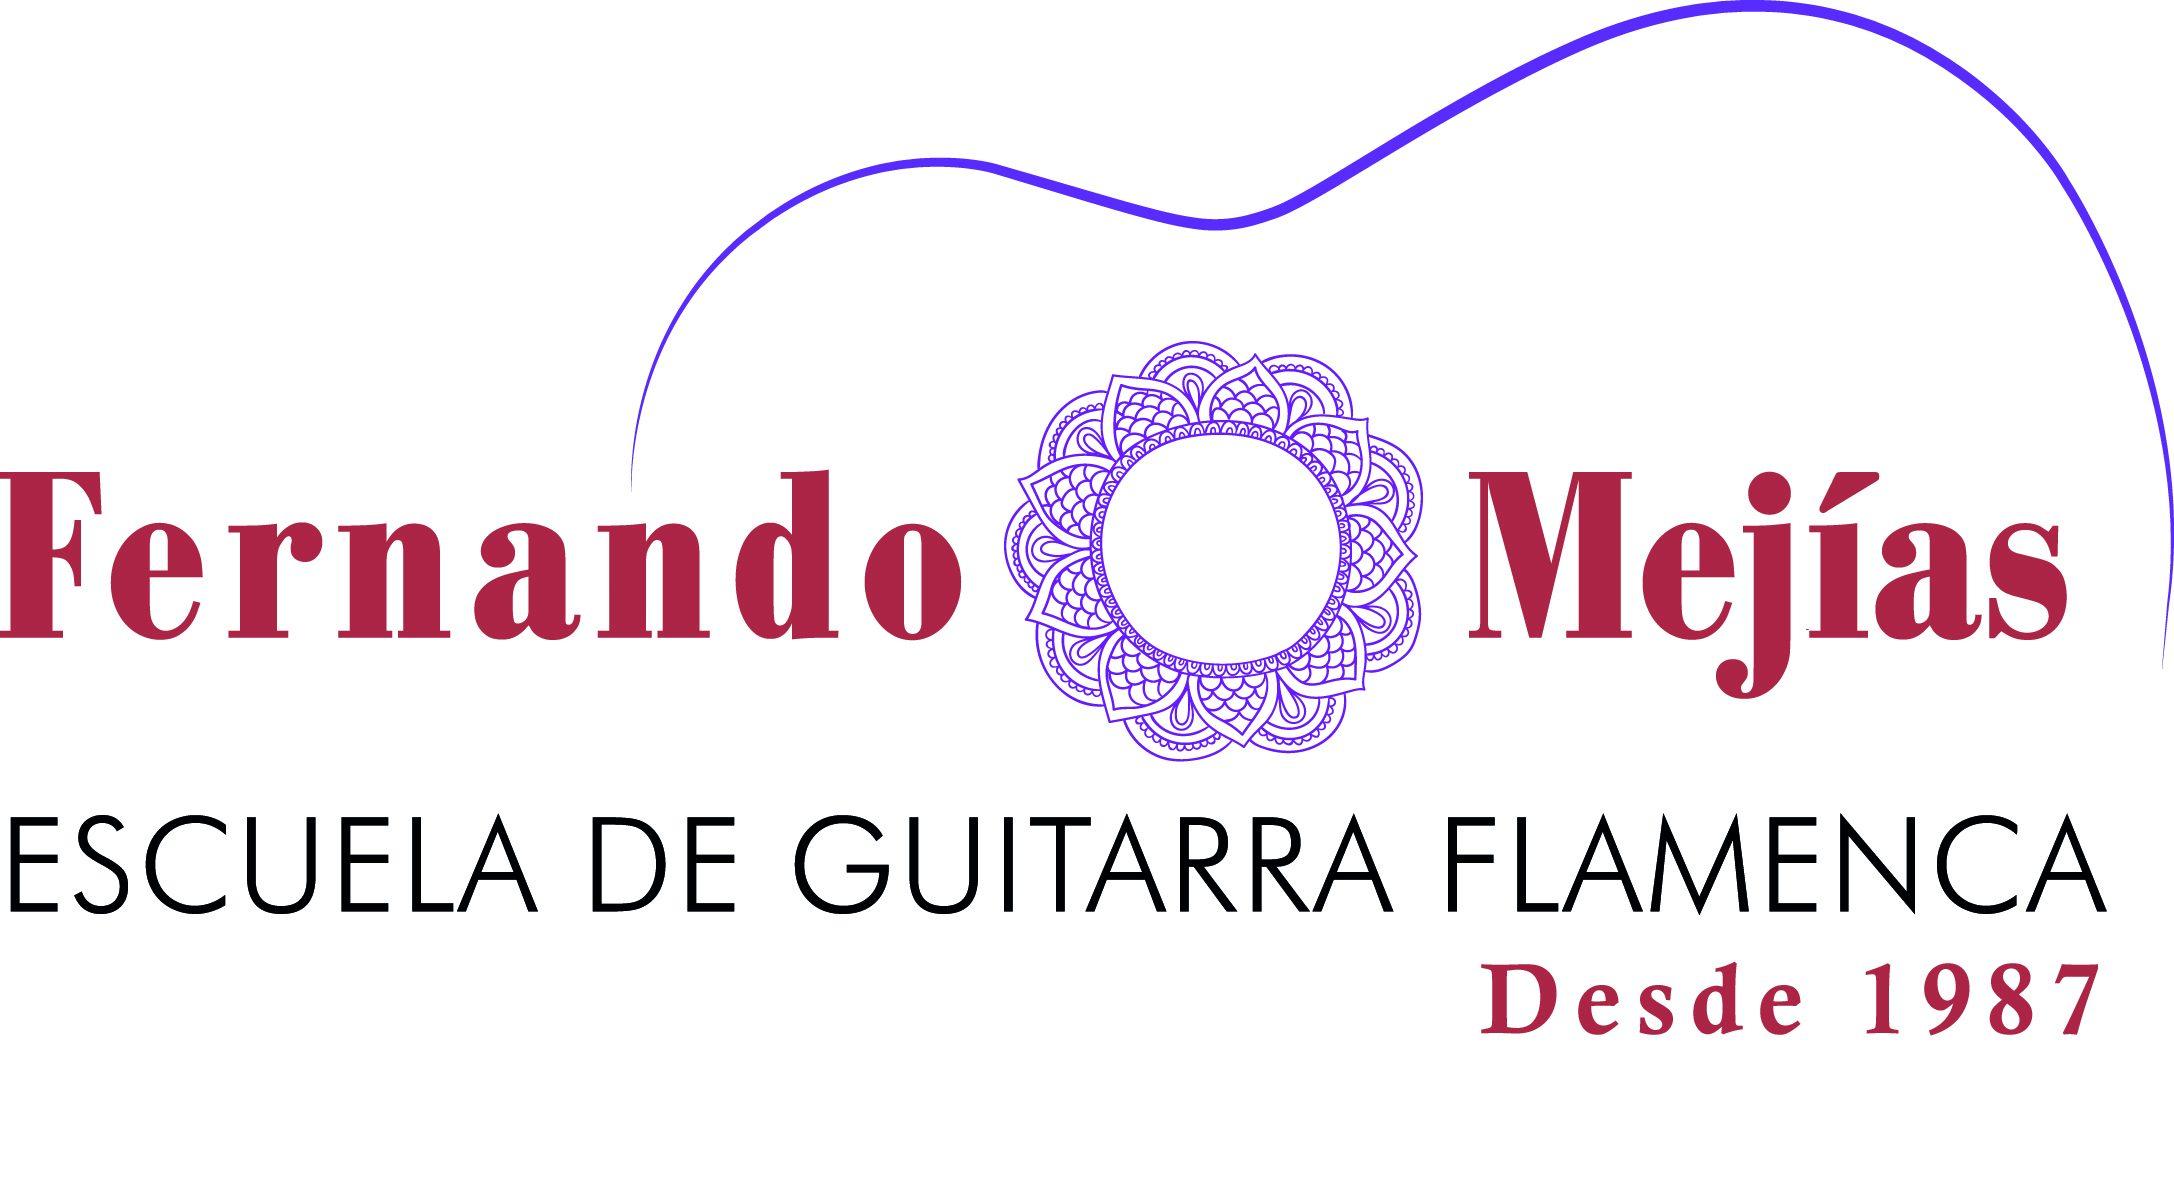 Escuela De Guitarra Flamenca Escuela De Guitarra Flamenca Fernando Mejías